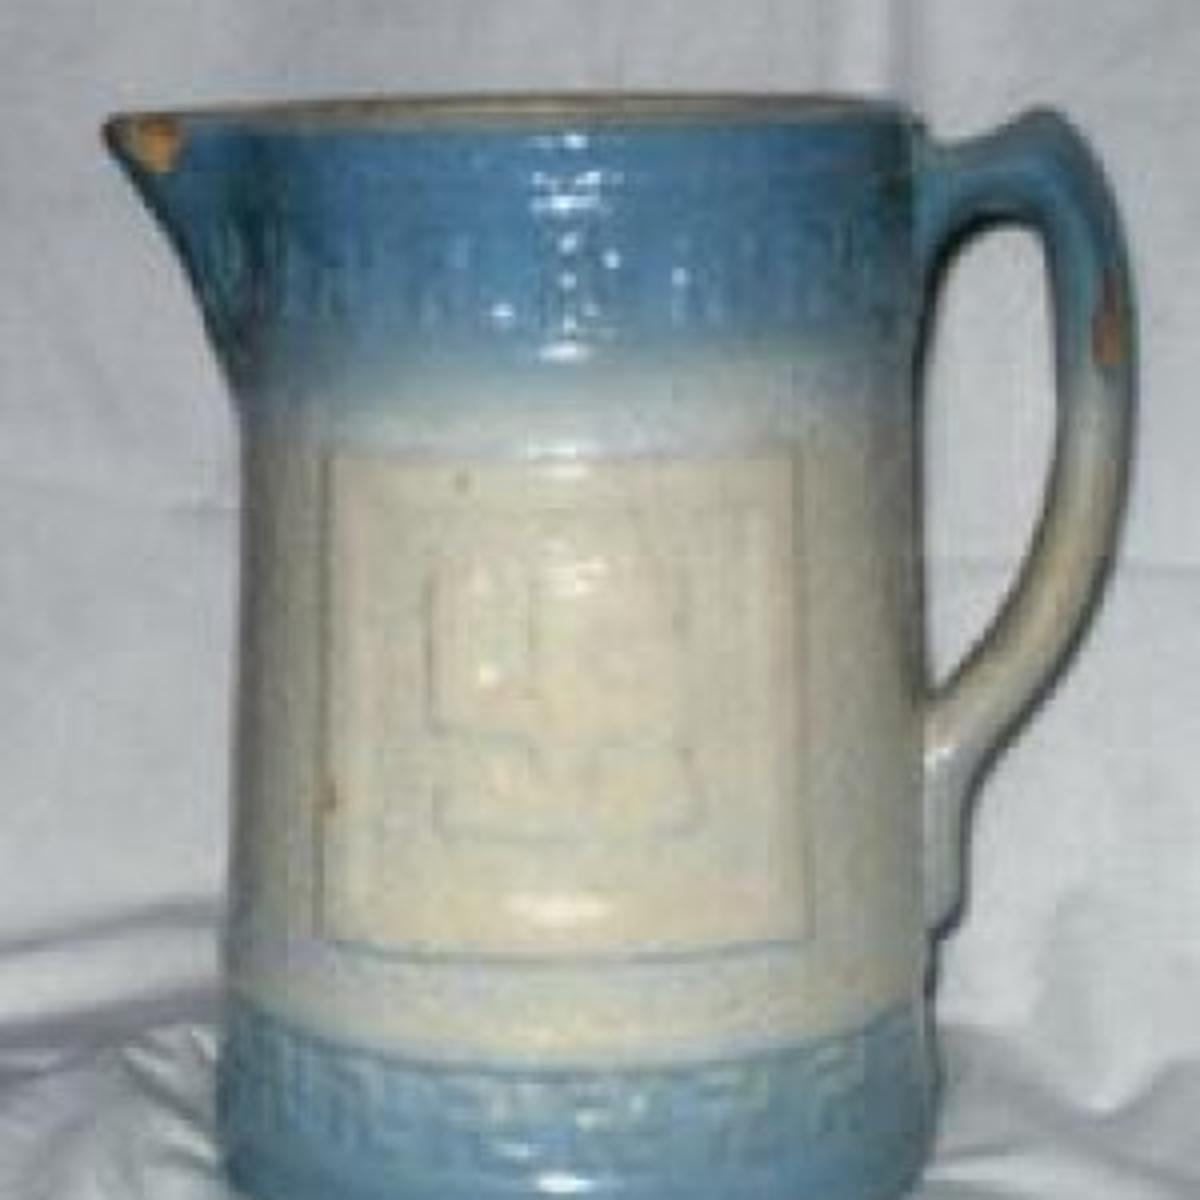 Circa-1920s pitcher a good catch   Progress in Siouxland